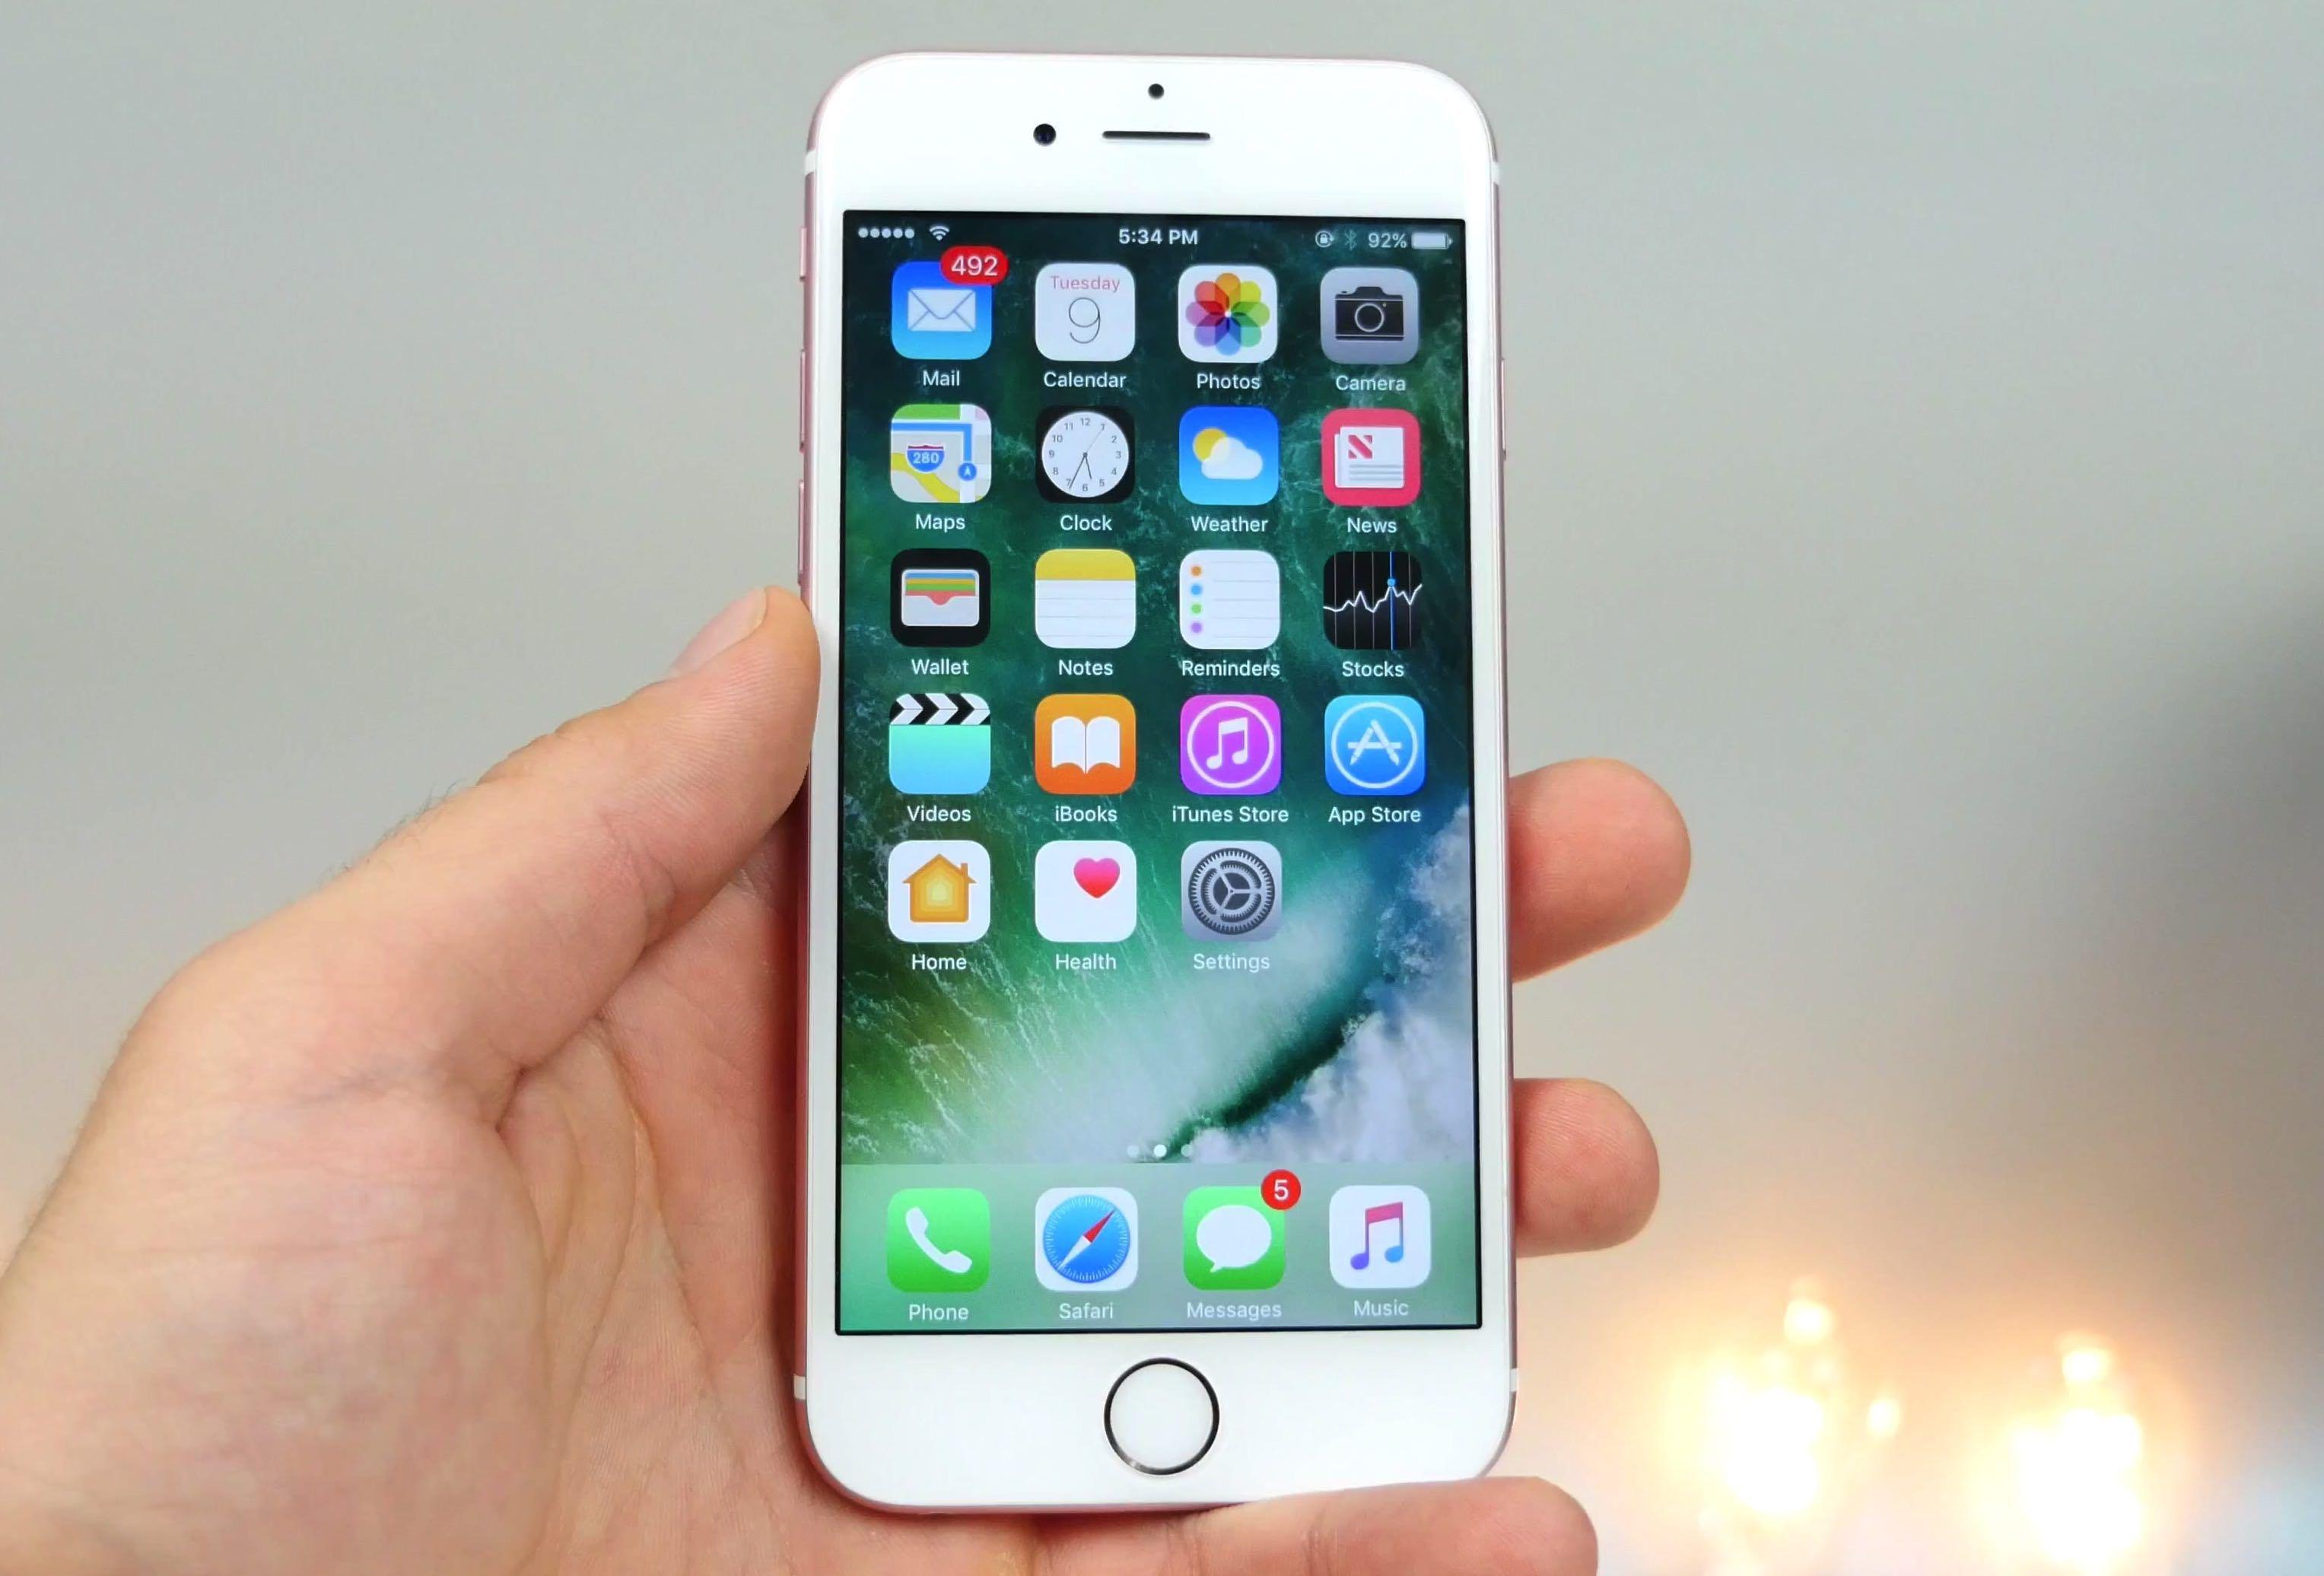 Apple представит iPhone 9 в следующем 2018-ом году  — Тим Кук